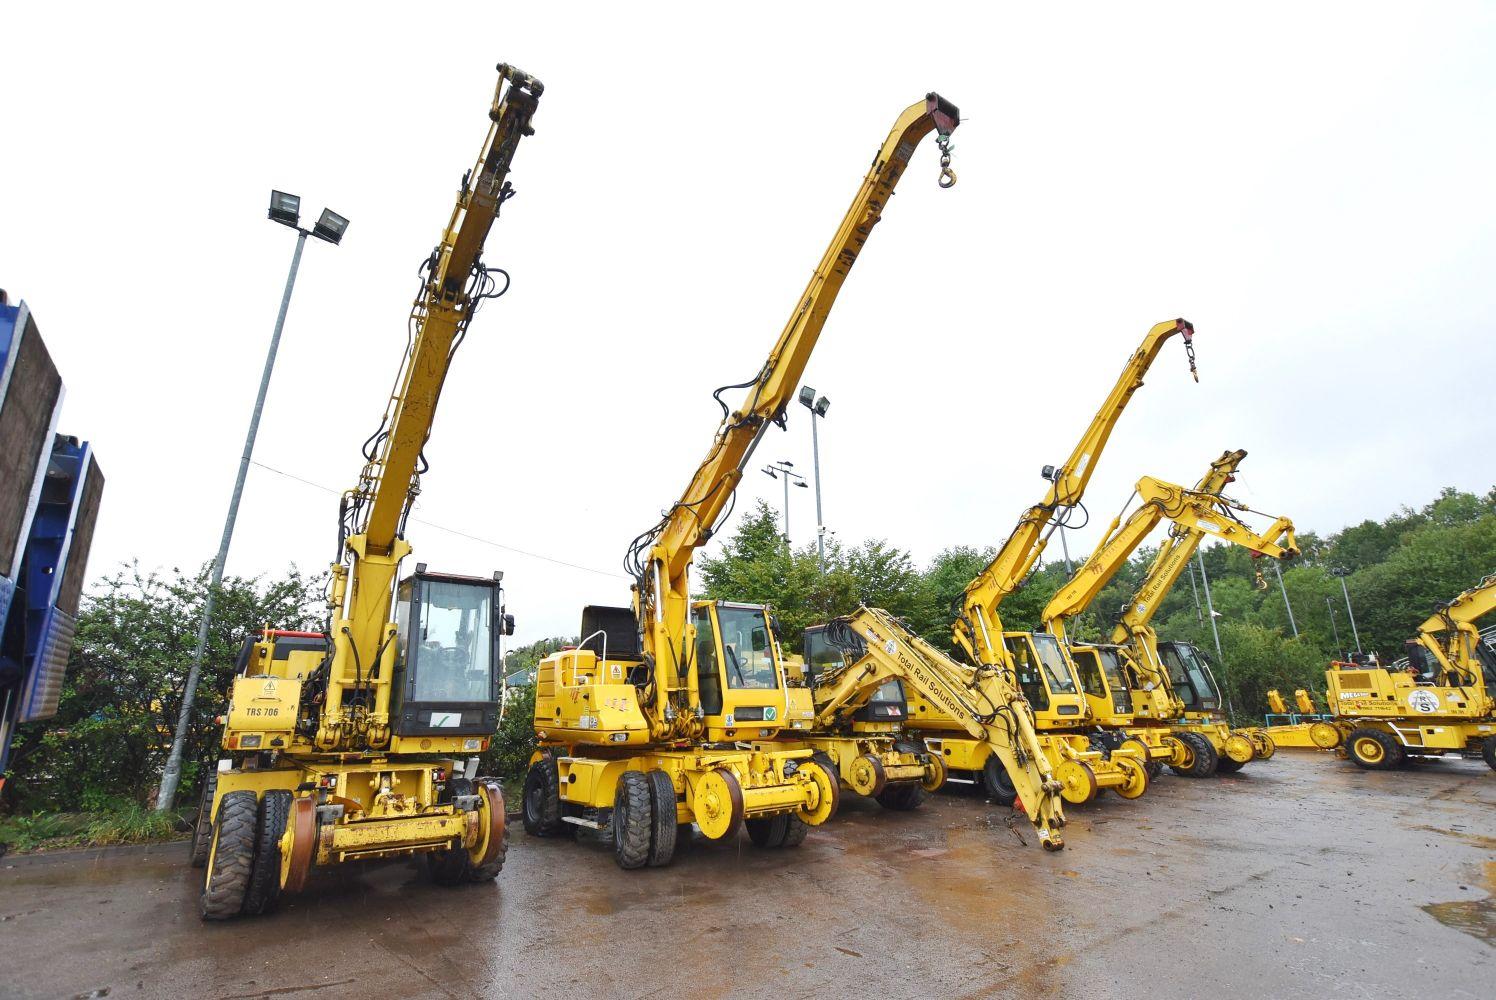 Road Rail Maintenance Contractors Plant (w6a gauge) and Equipment